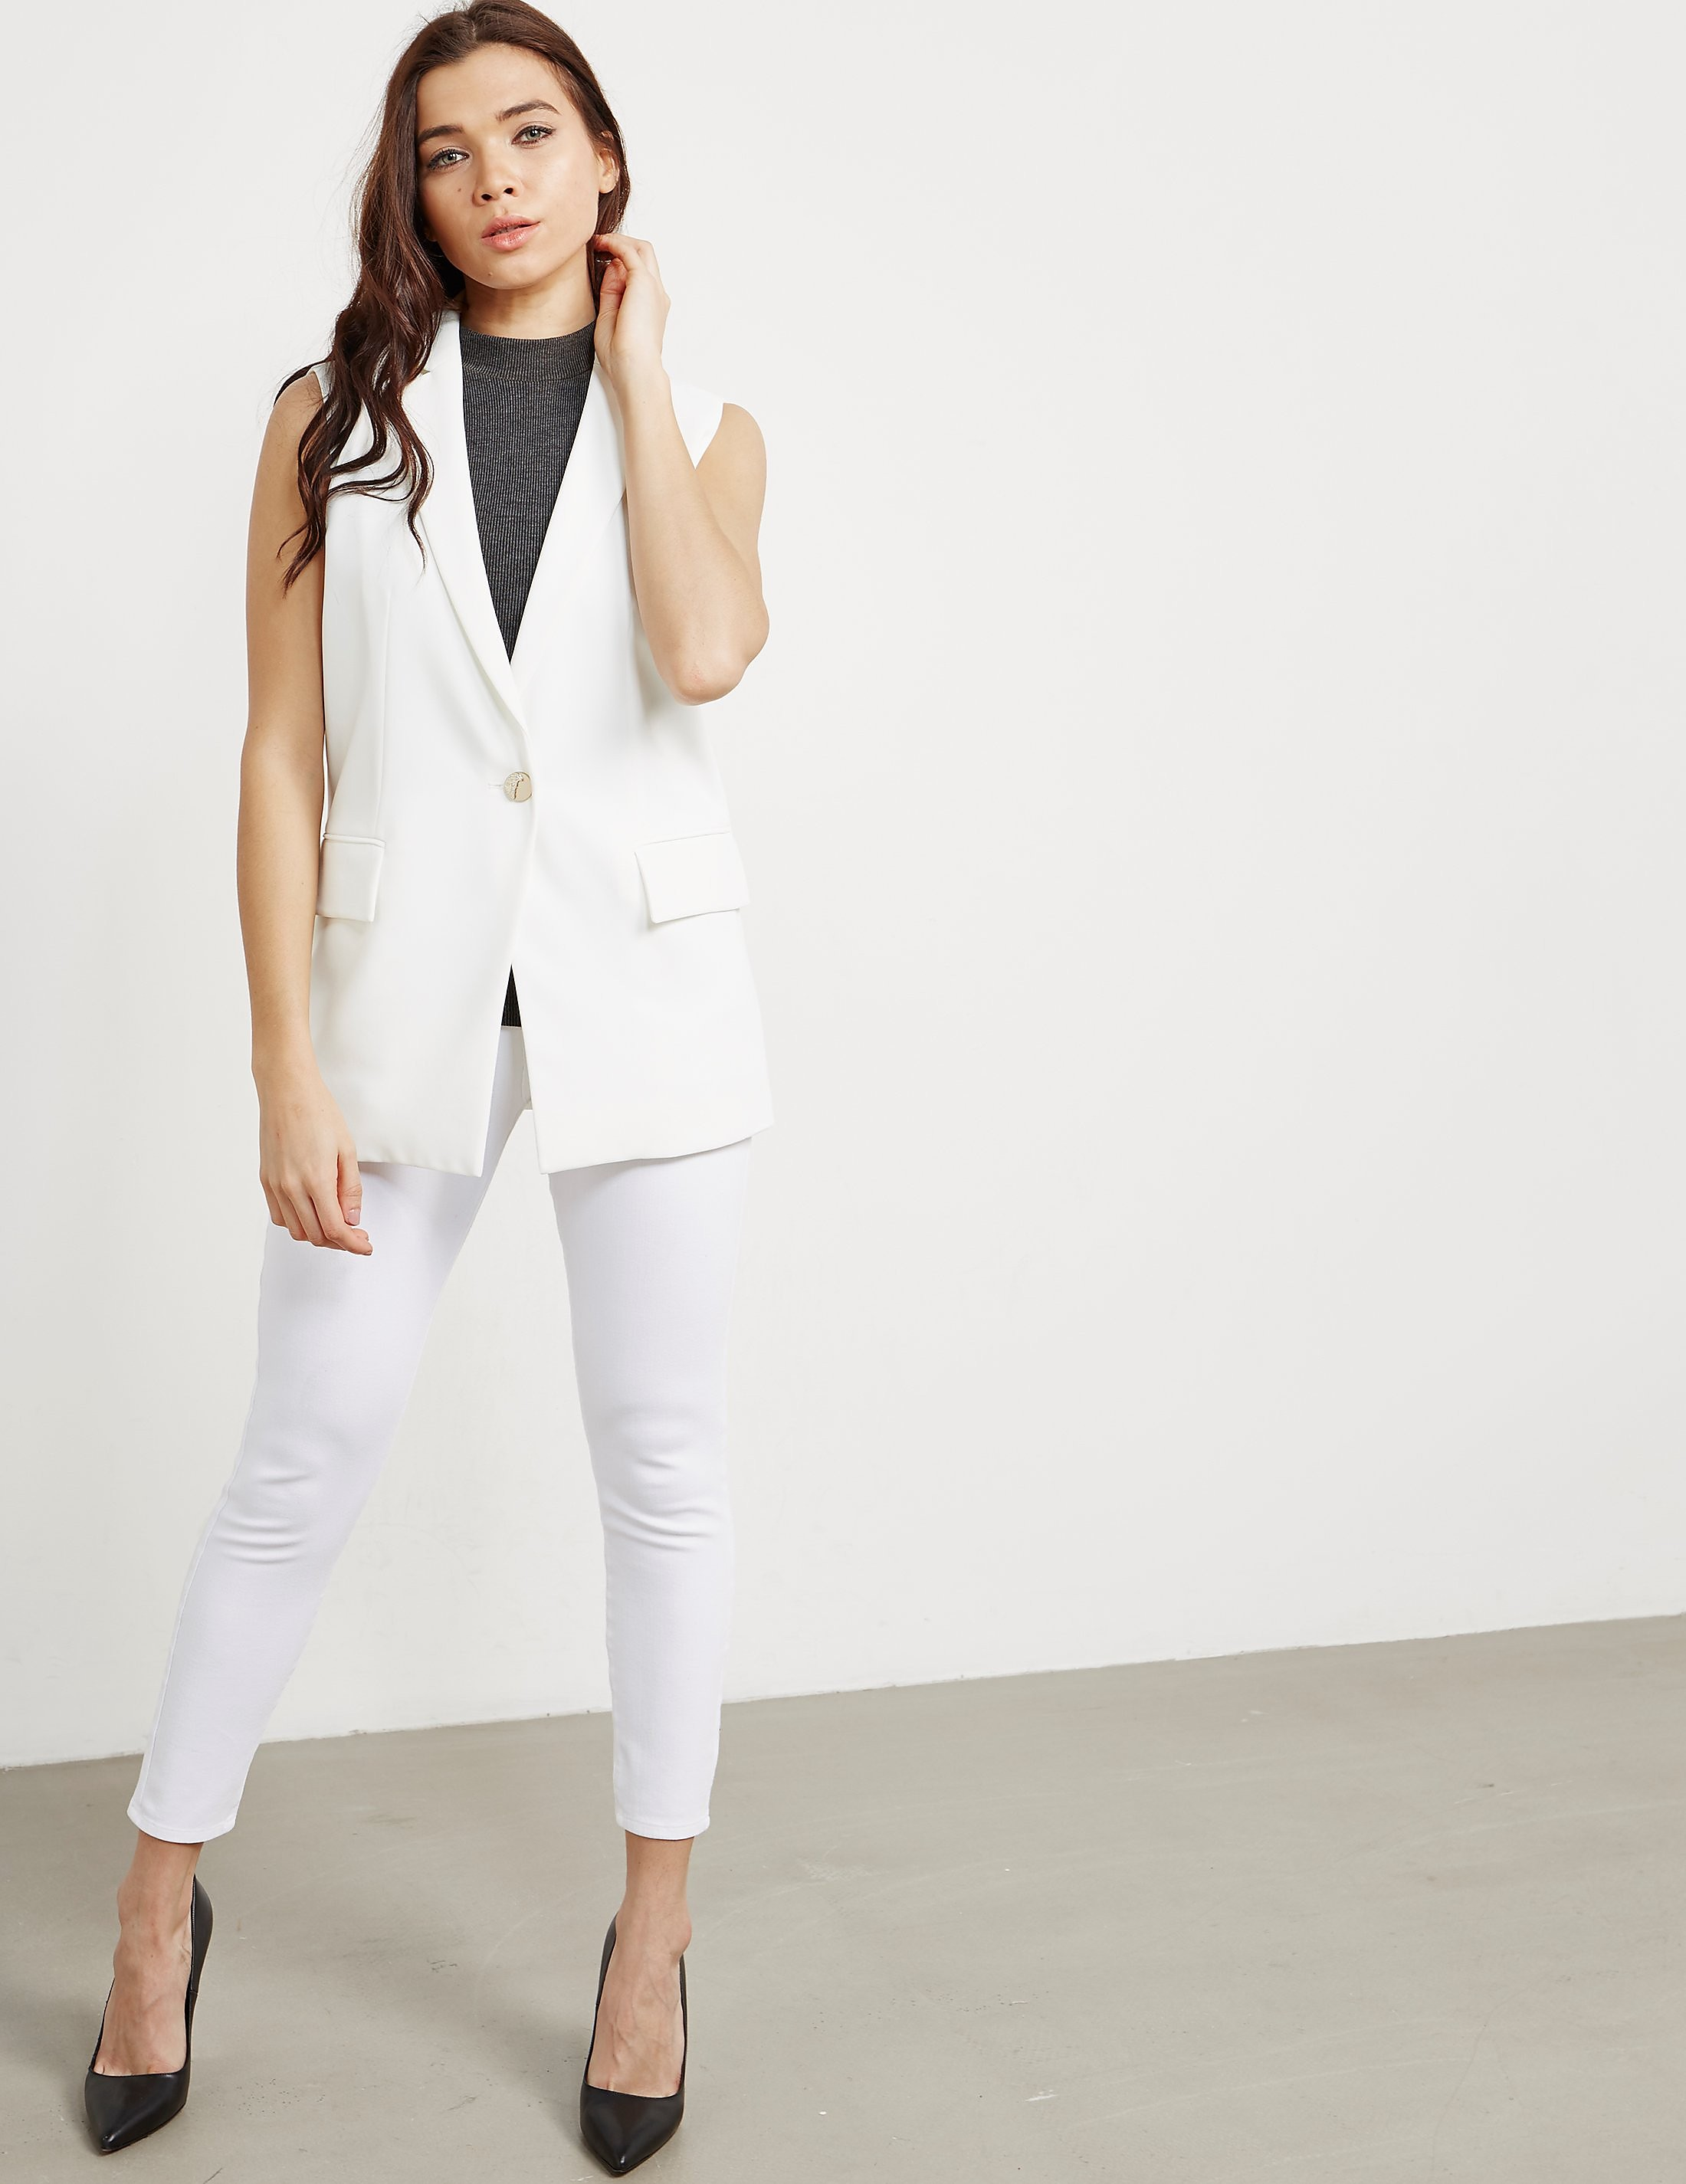 Versace Woven Blazer Jacket